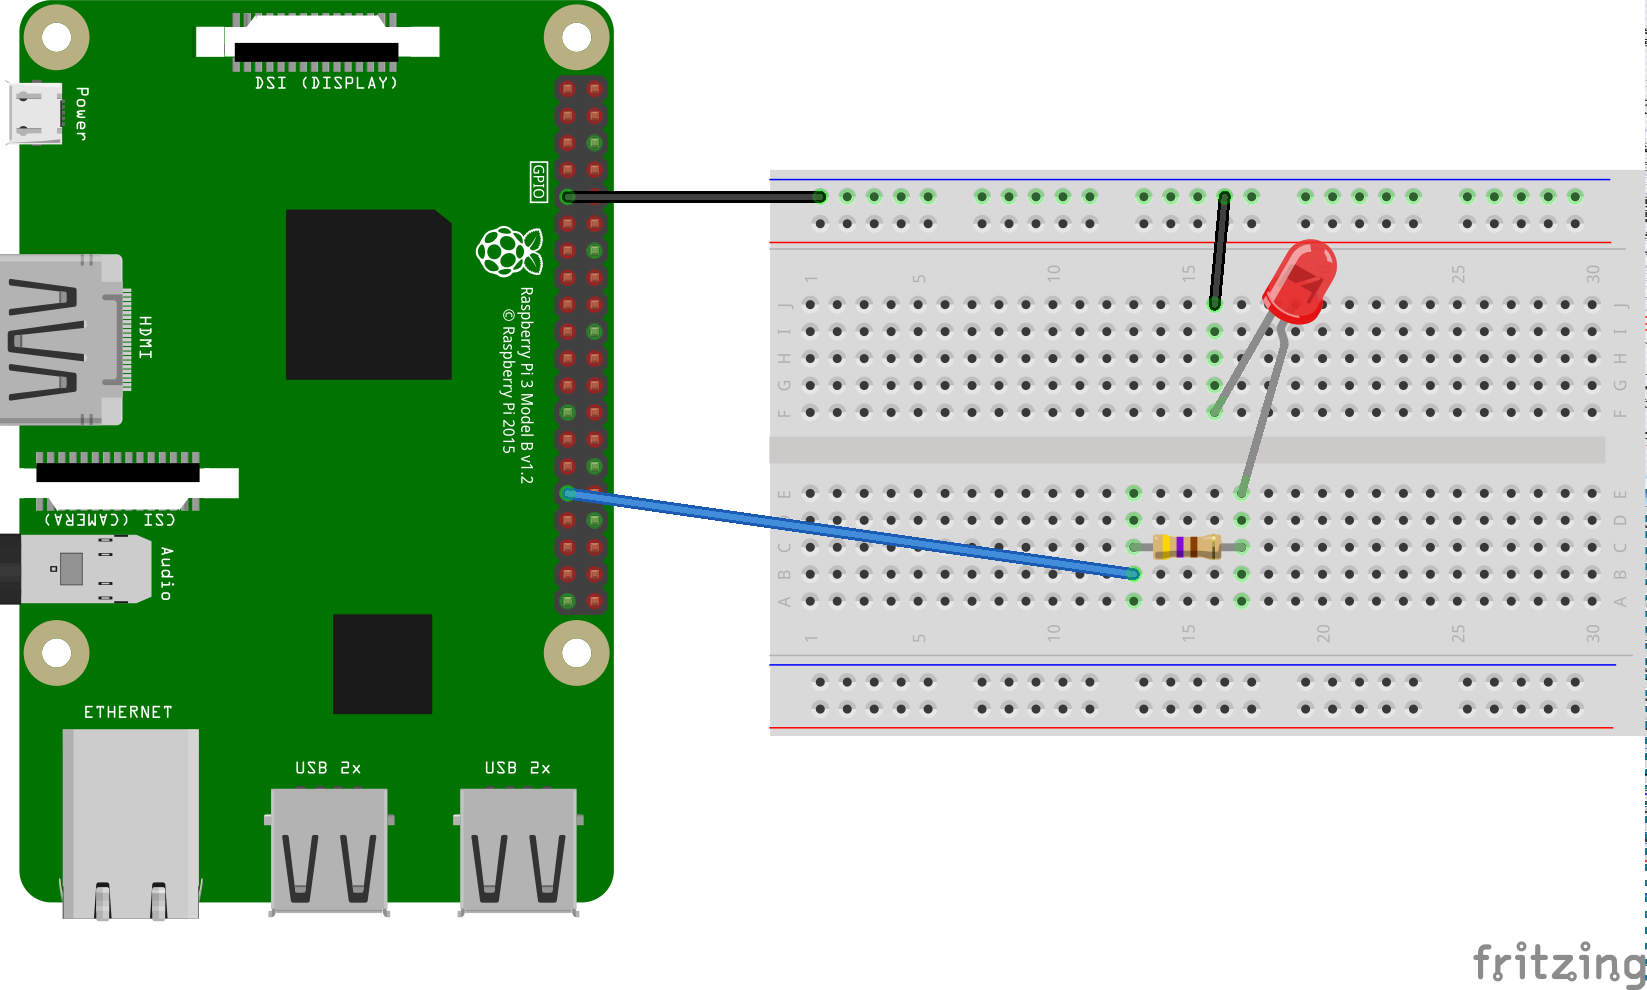 raspberry_pi_rpi3_schematics_(1).png